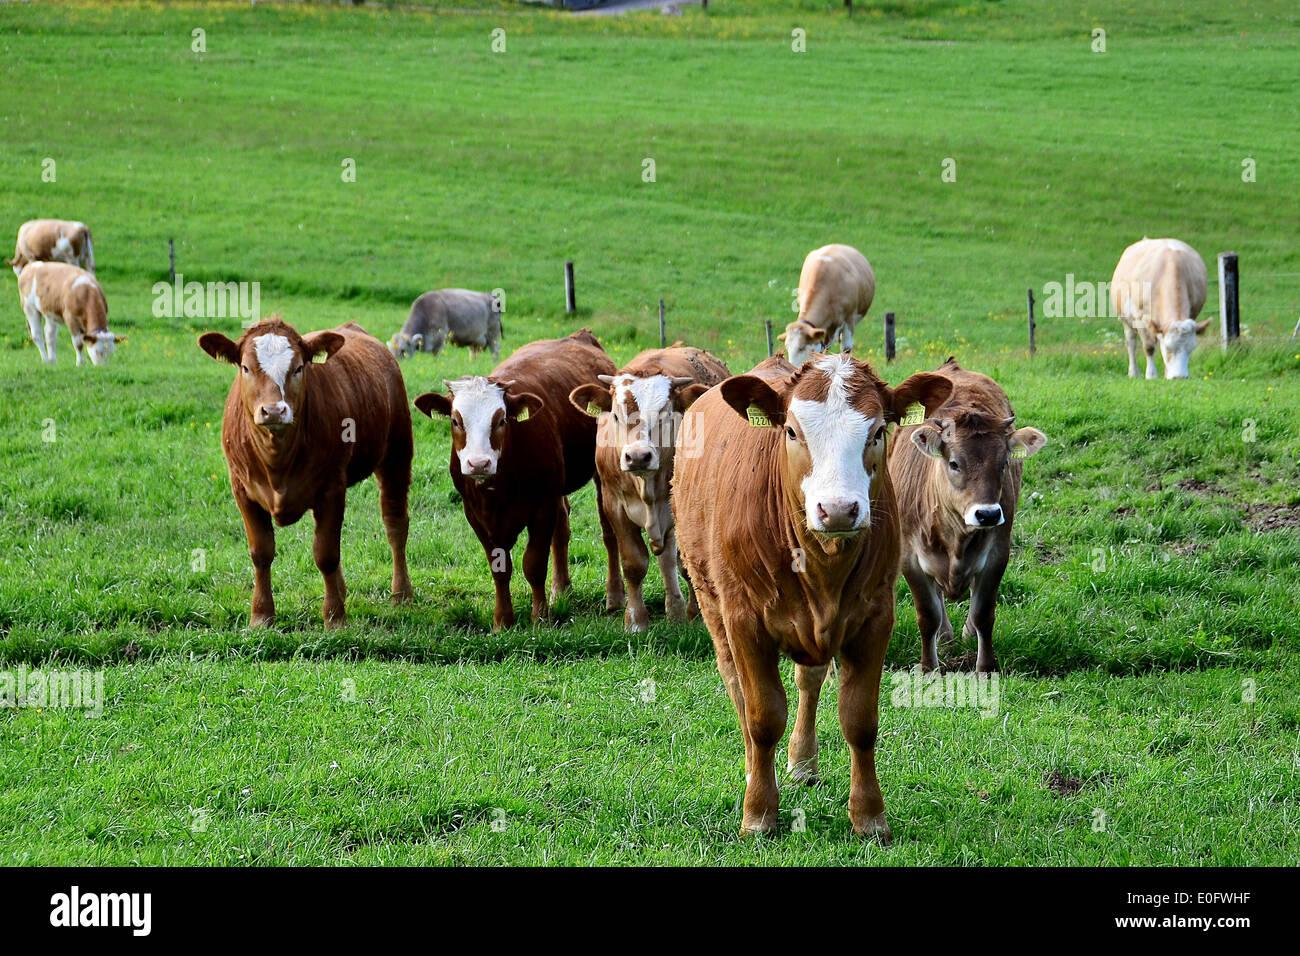 Neugierige Kühe in Worb, Schweiz Stockbild